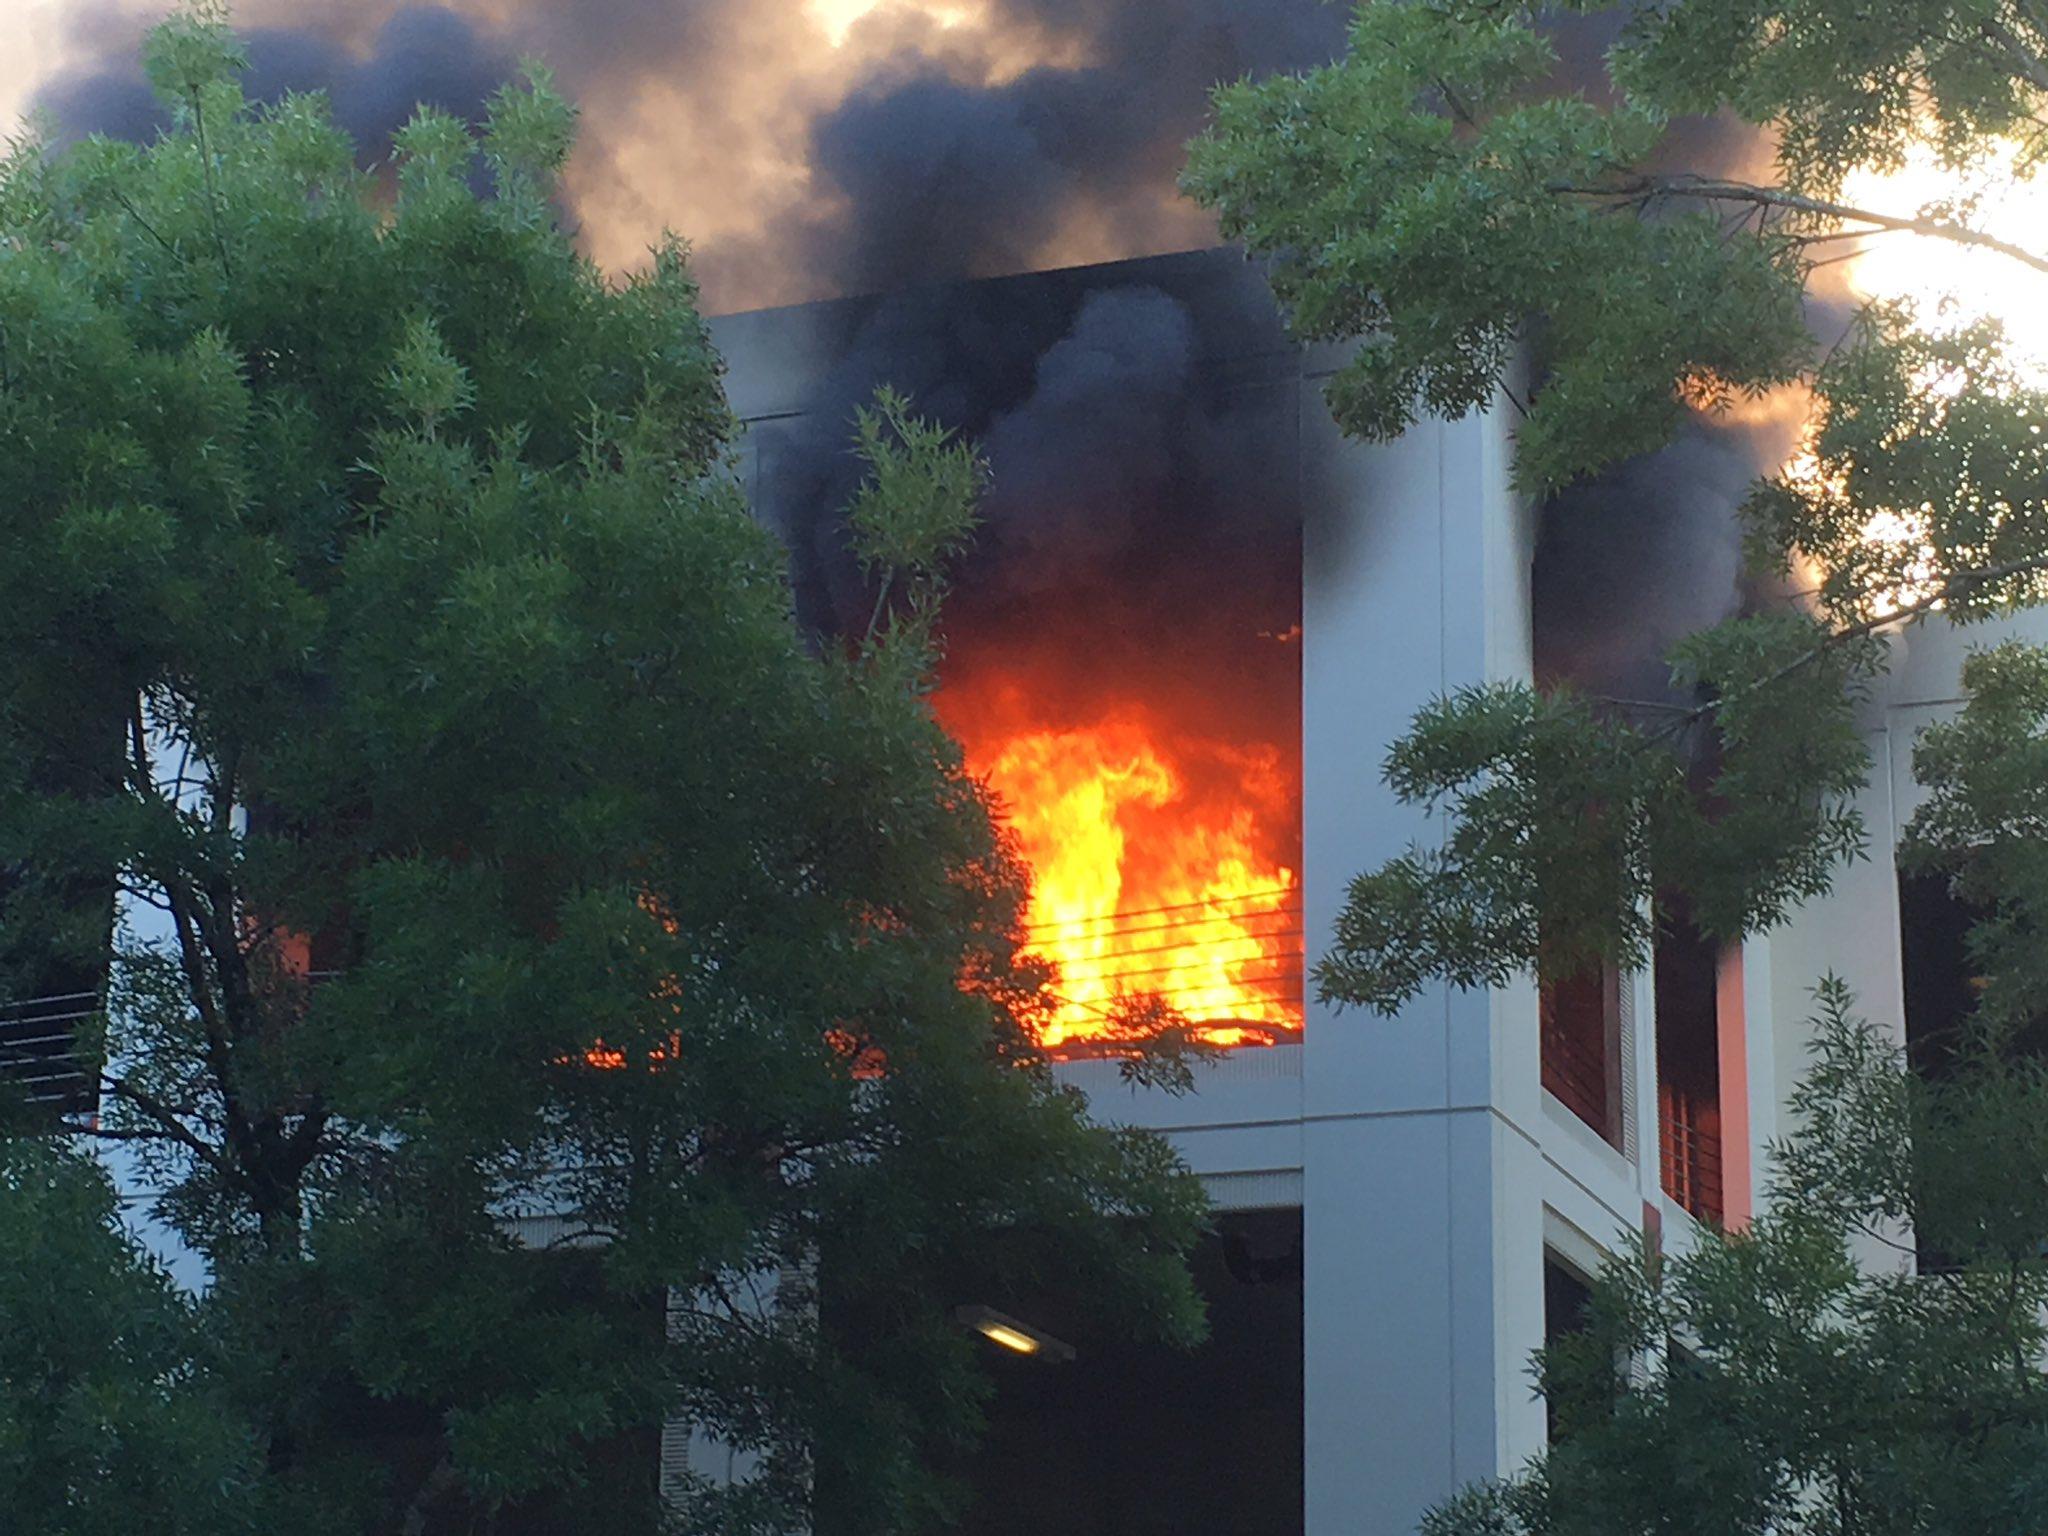 Courtesy Hillsboro Fire Department